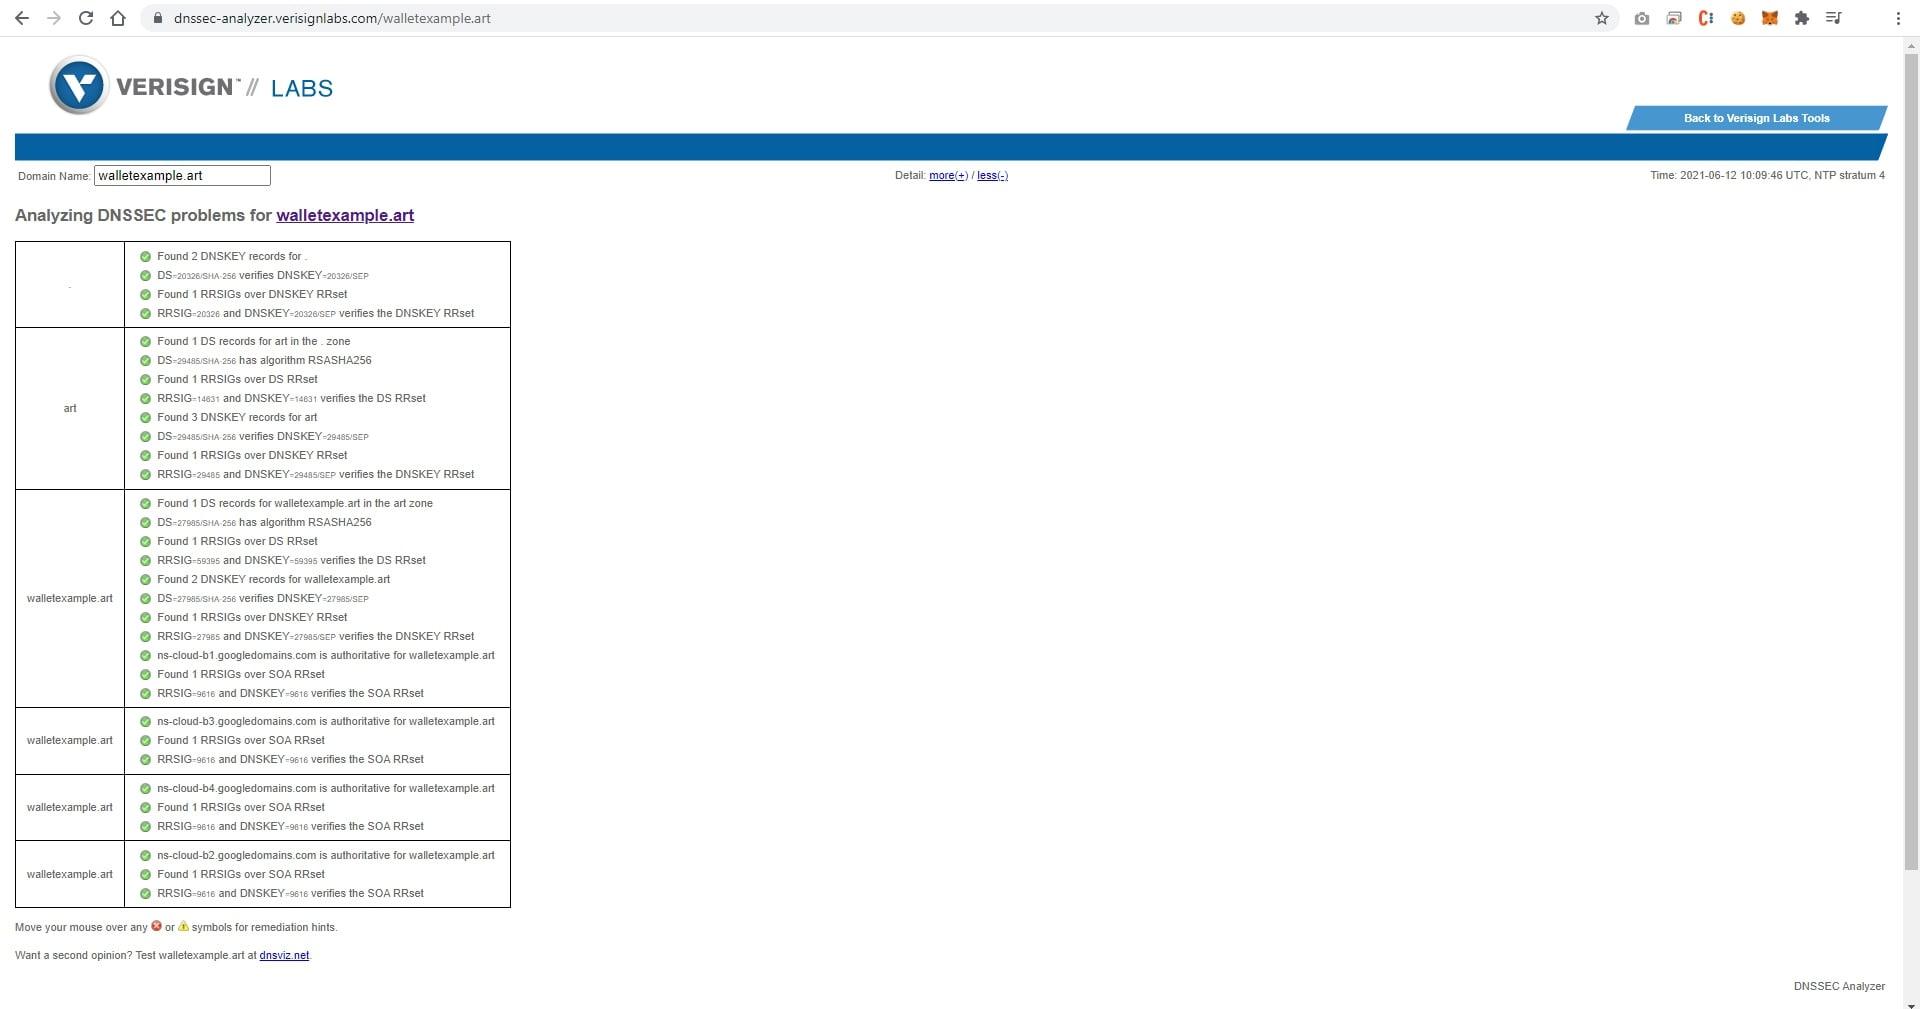 Verisign DNSSEC analyzer